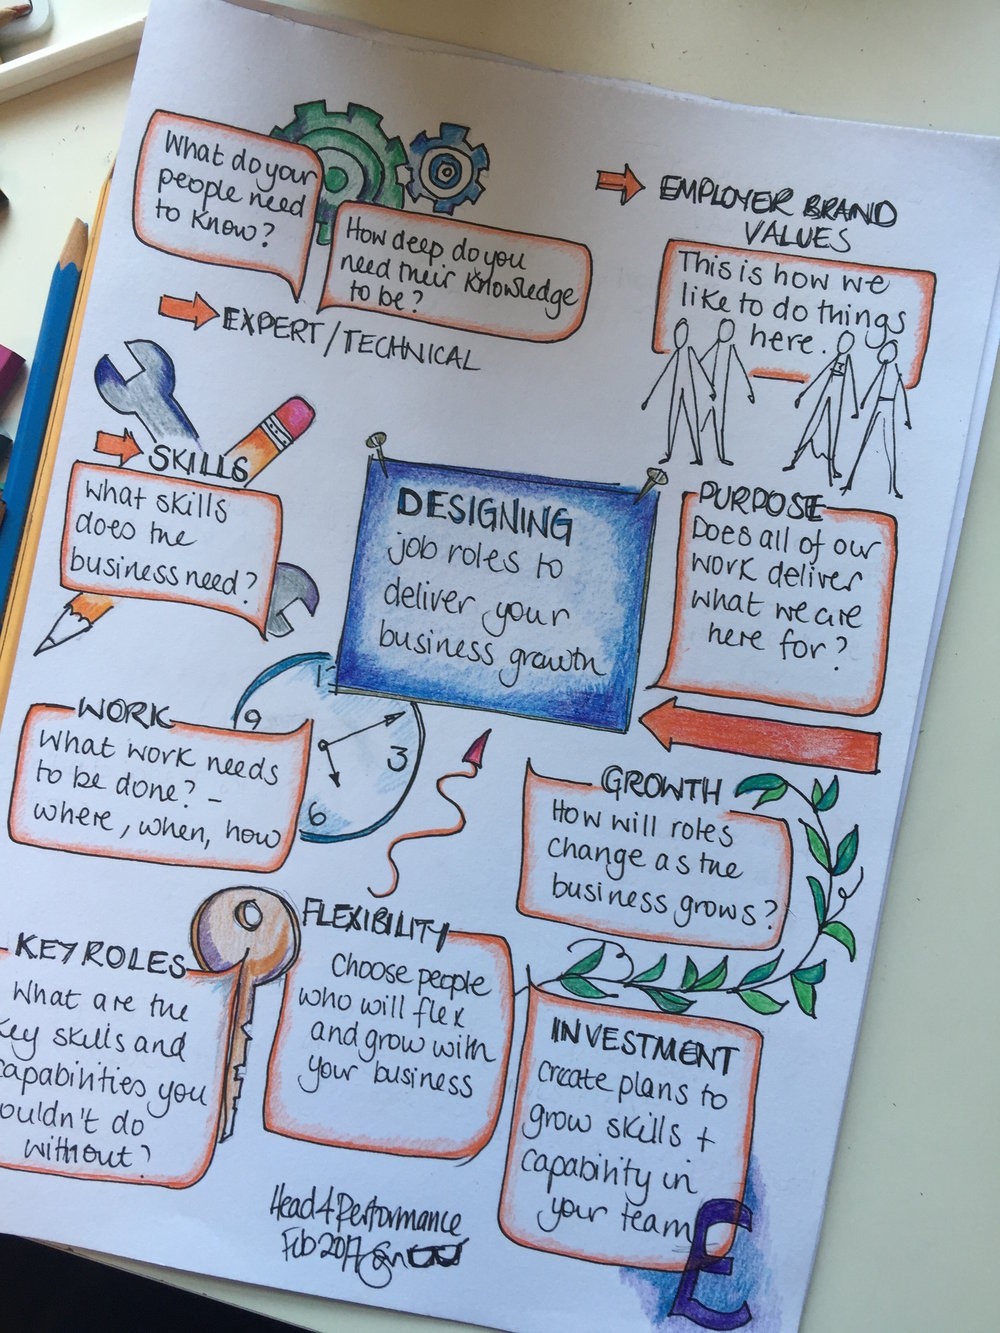 Designing Job Roles